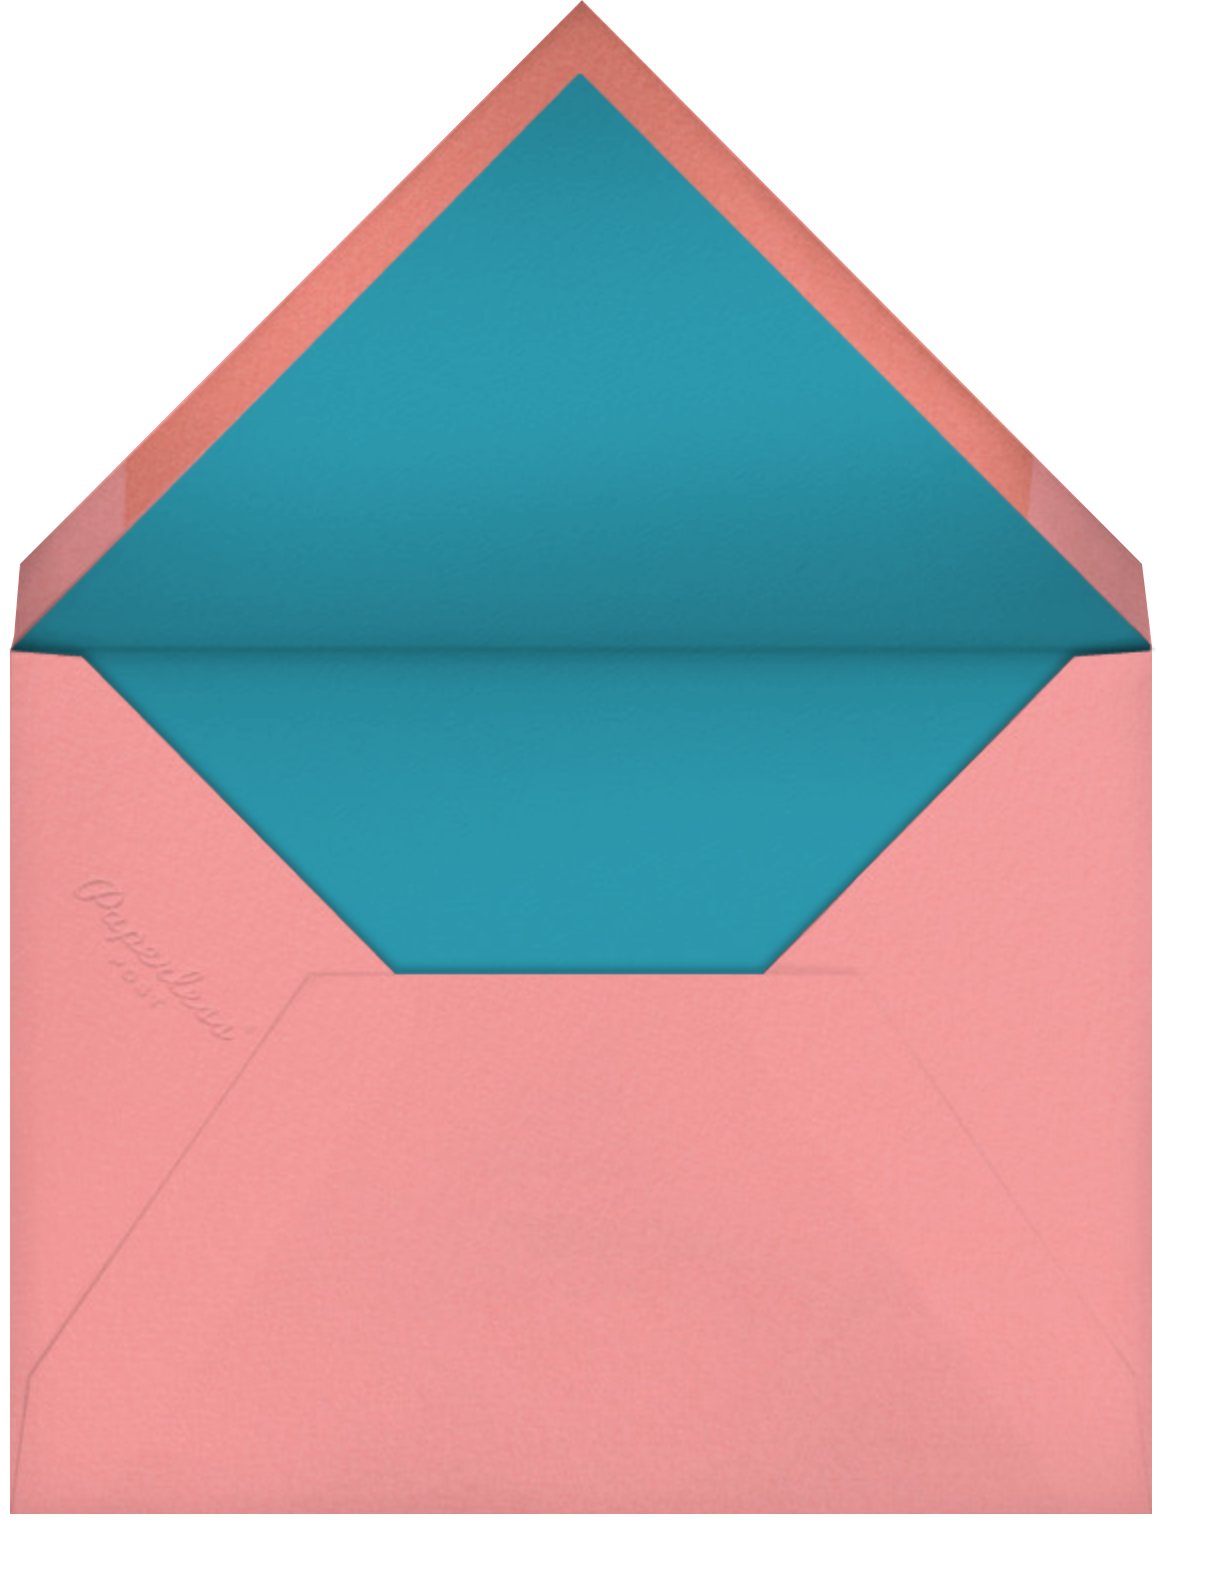 Rotund Rabbit (Barbara Dziadosz) - Red Cap Cards - Envelope